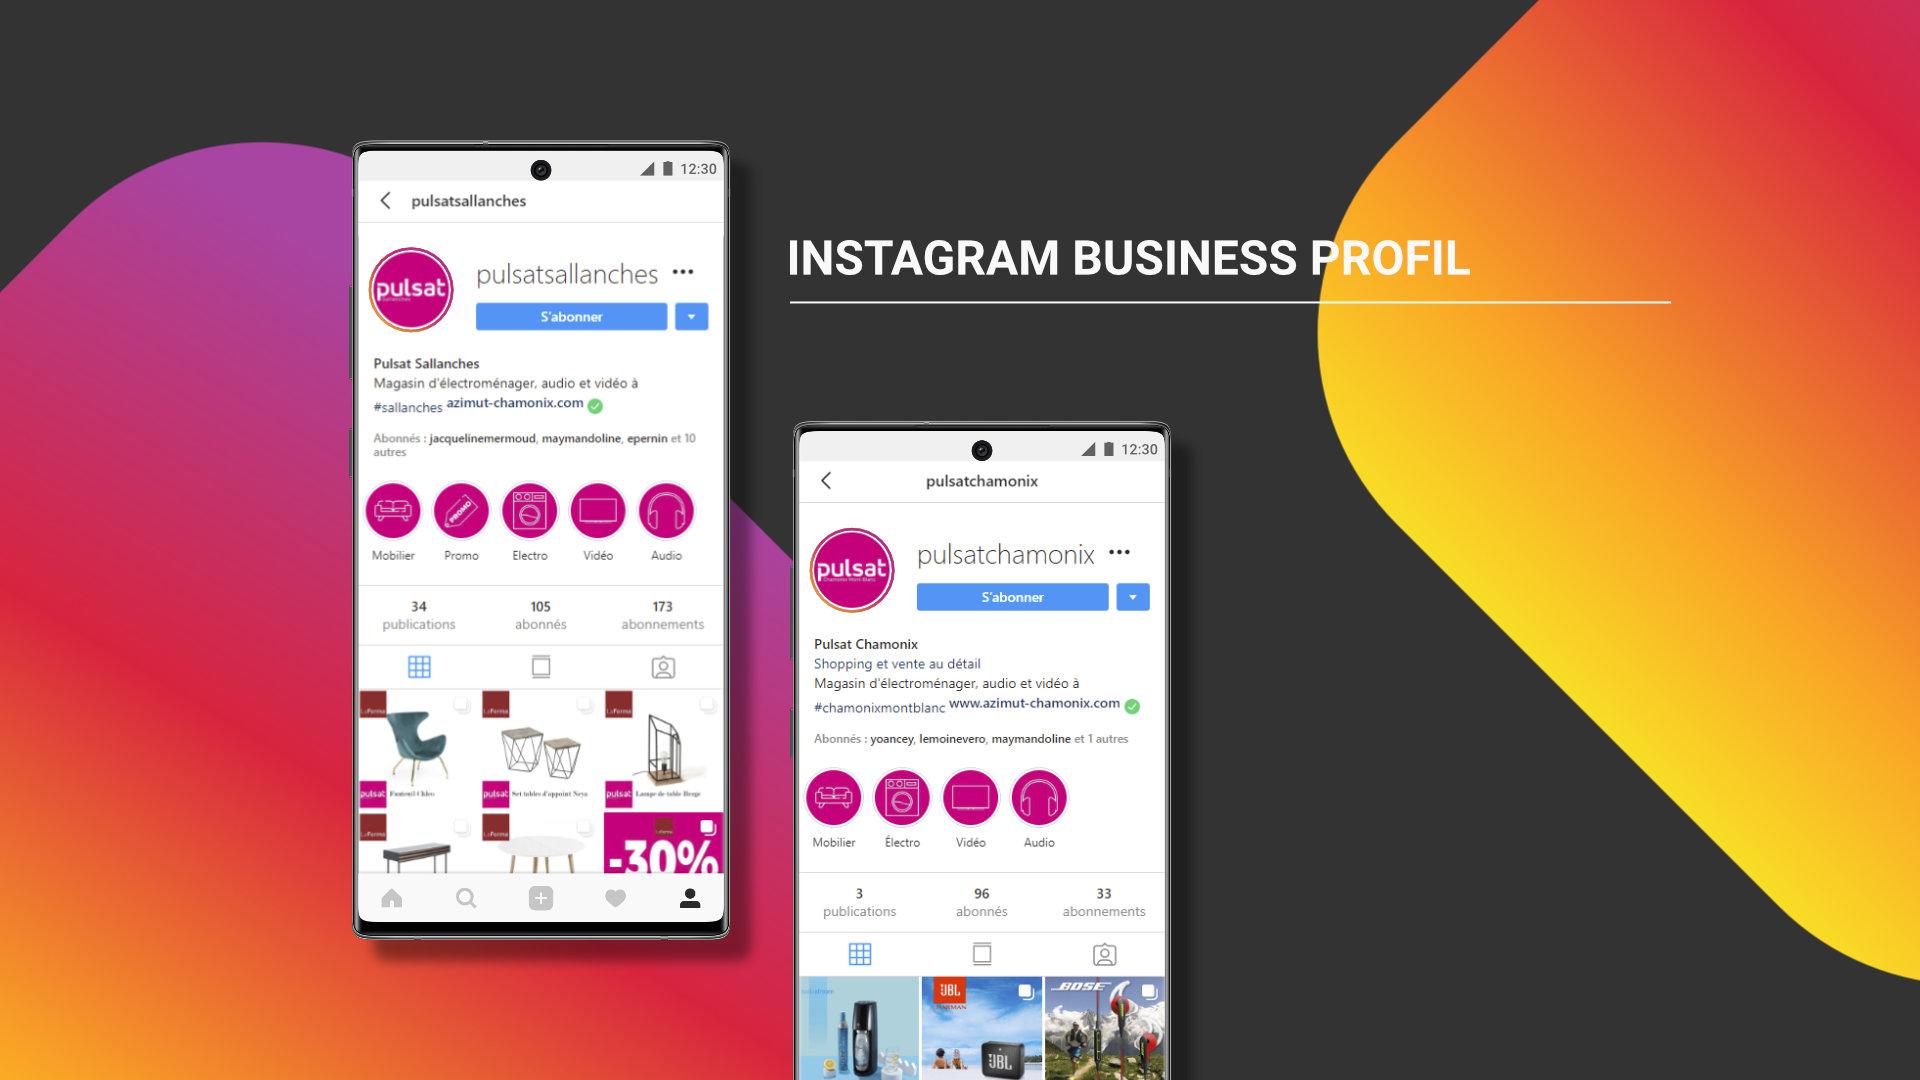 Pulsat Instagram profil